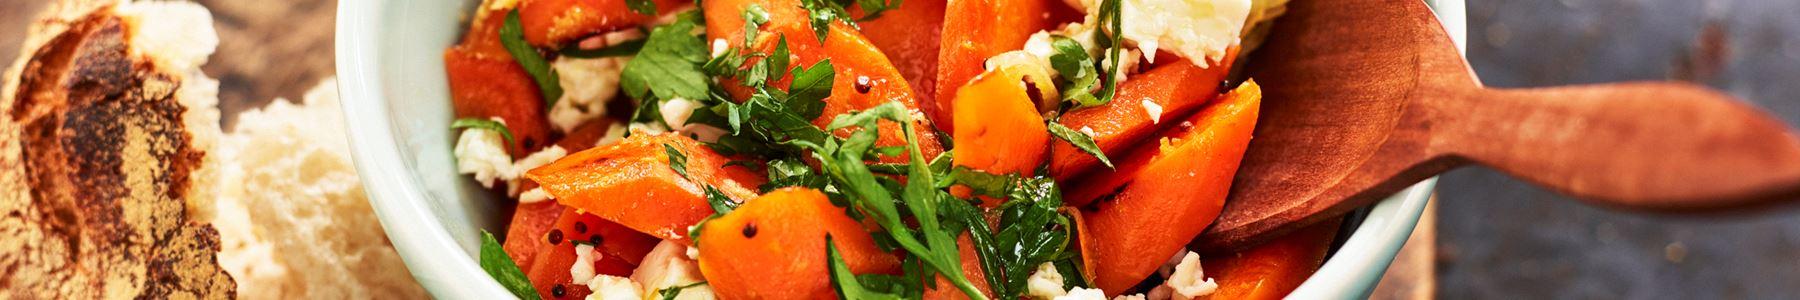 Morötter + Ramadan + Sallad